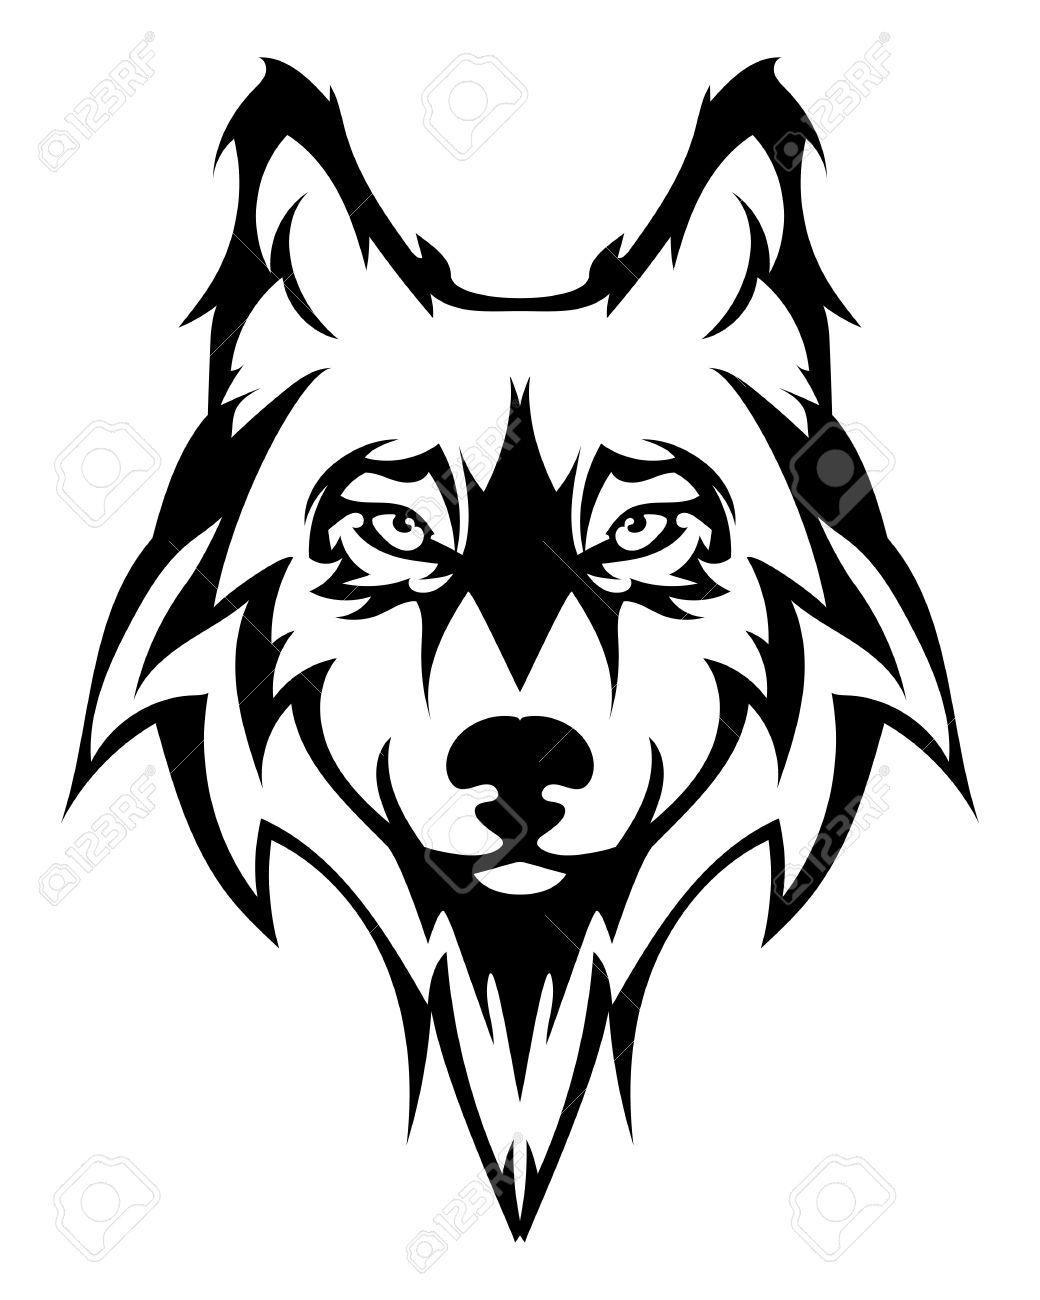 1040x1300 Wolf Face Beautiful Wolf Tattoo.vector Wolfs Head As A Design